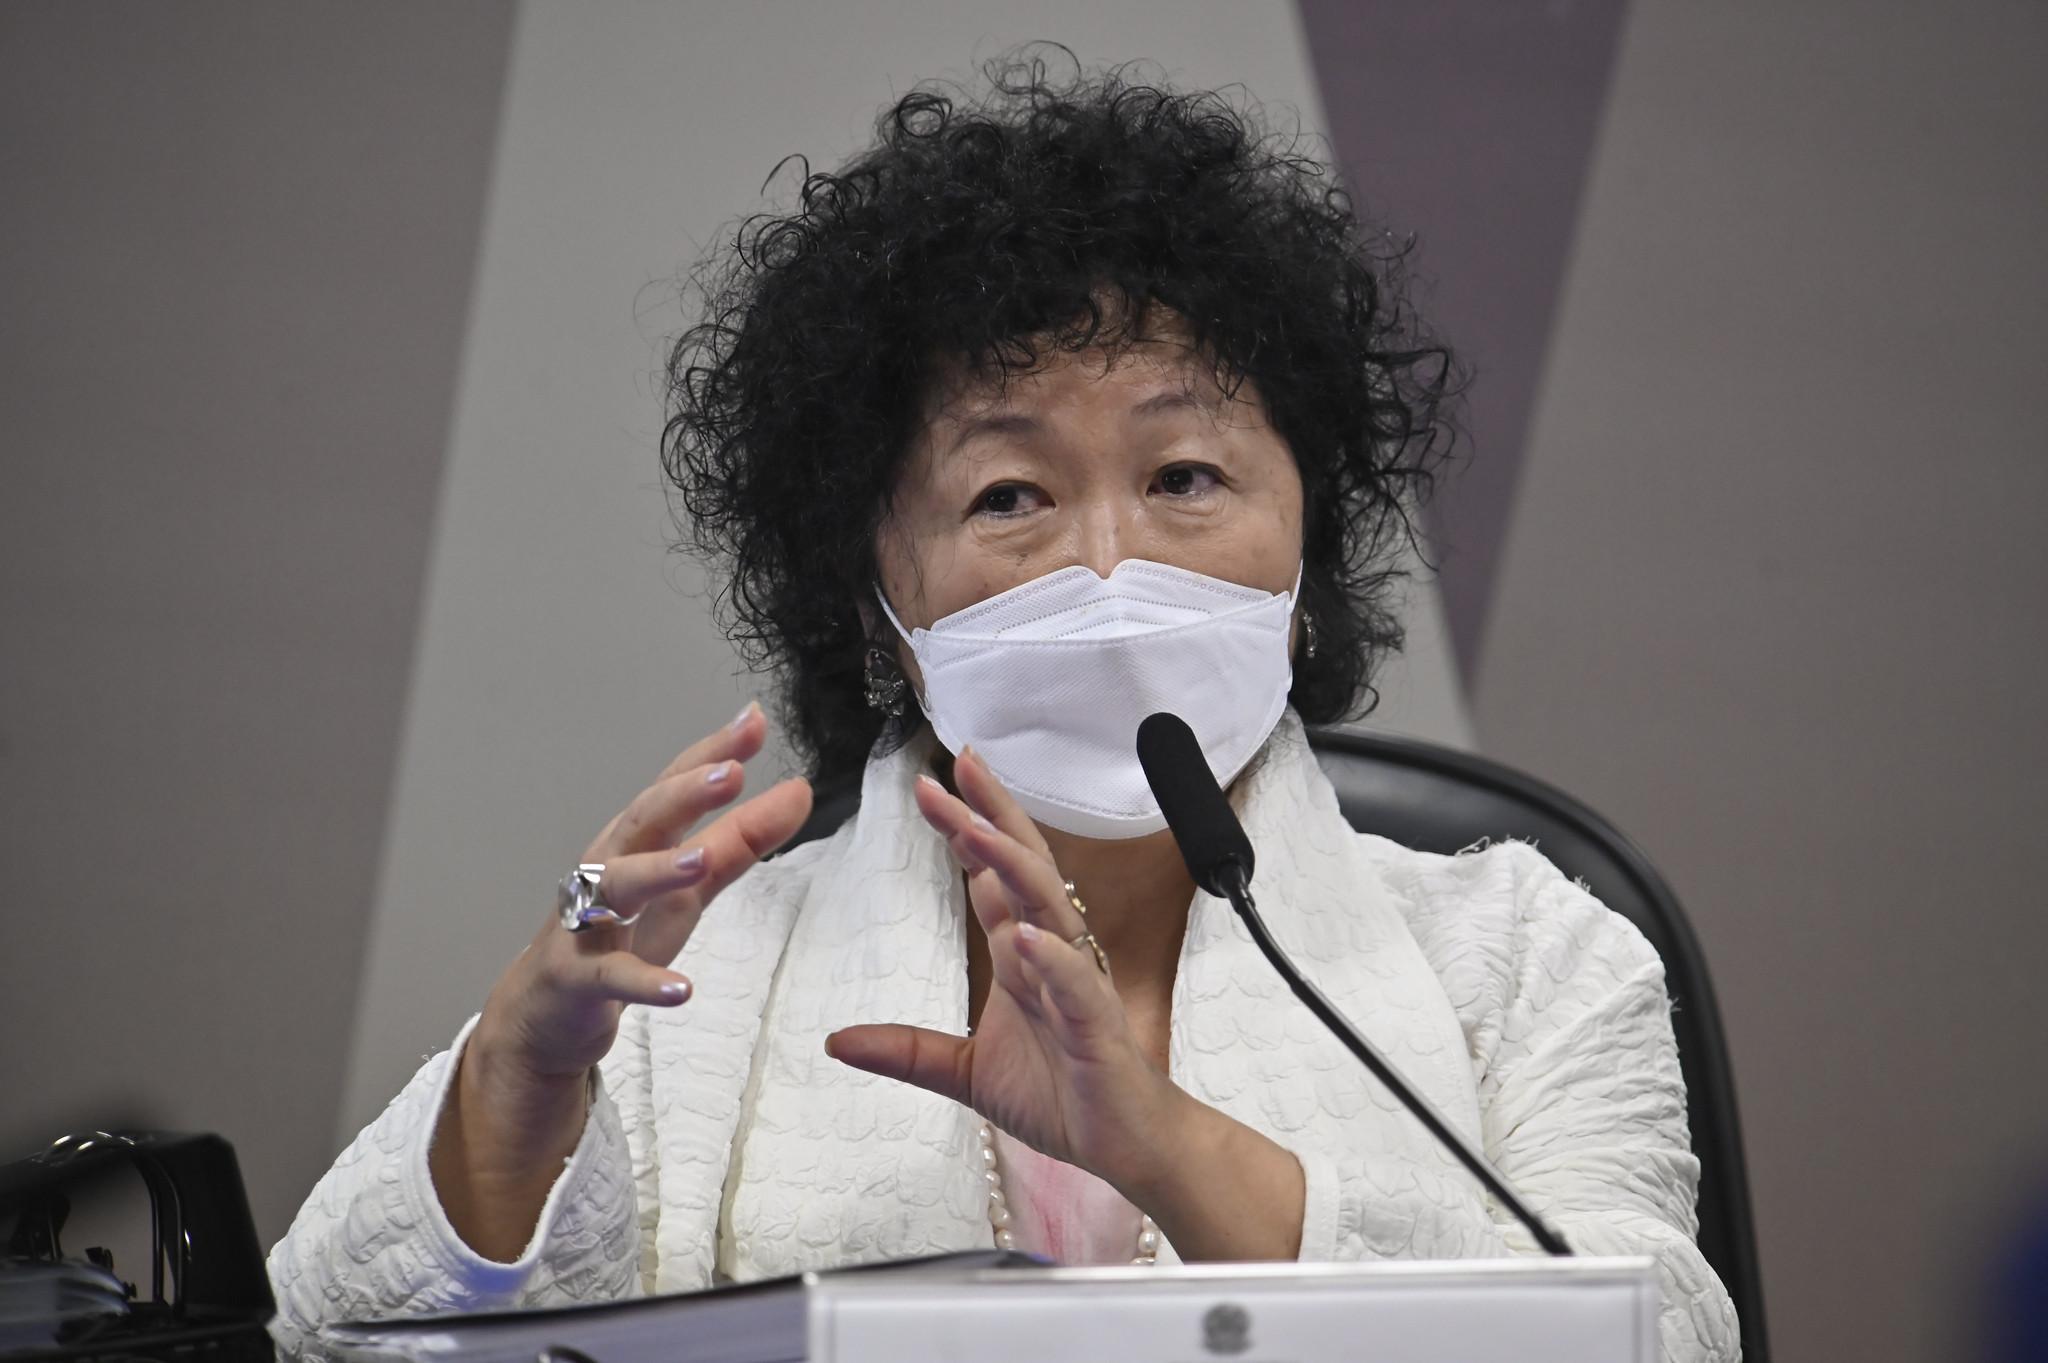 IMAGEM: Saiba tudo o que disse Nise Yamaguchi na CPI